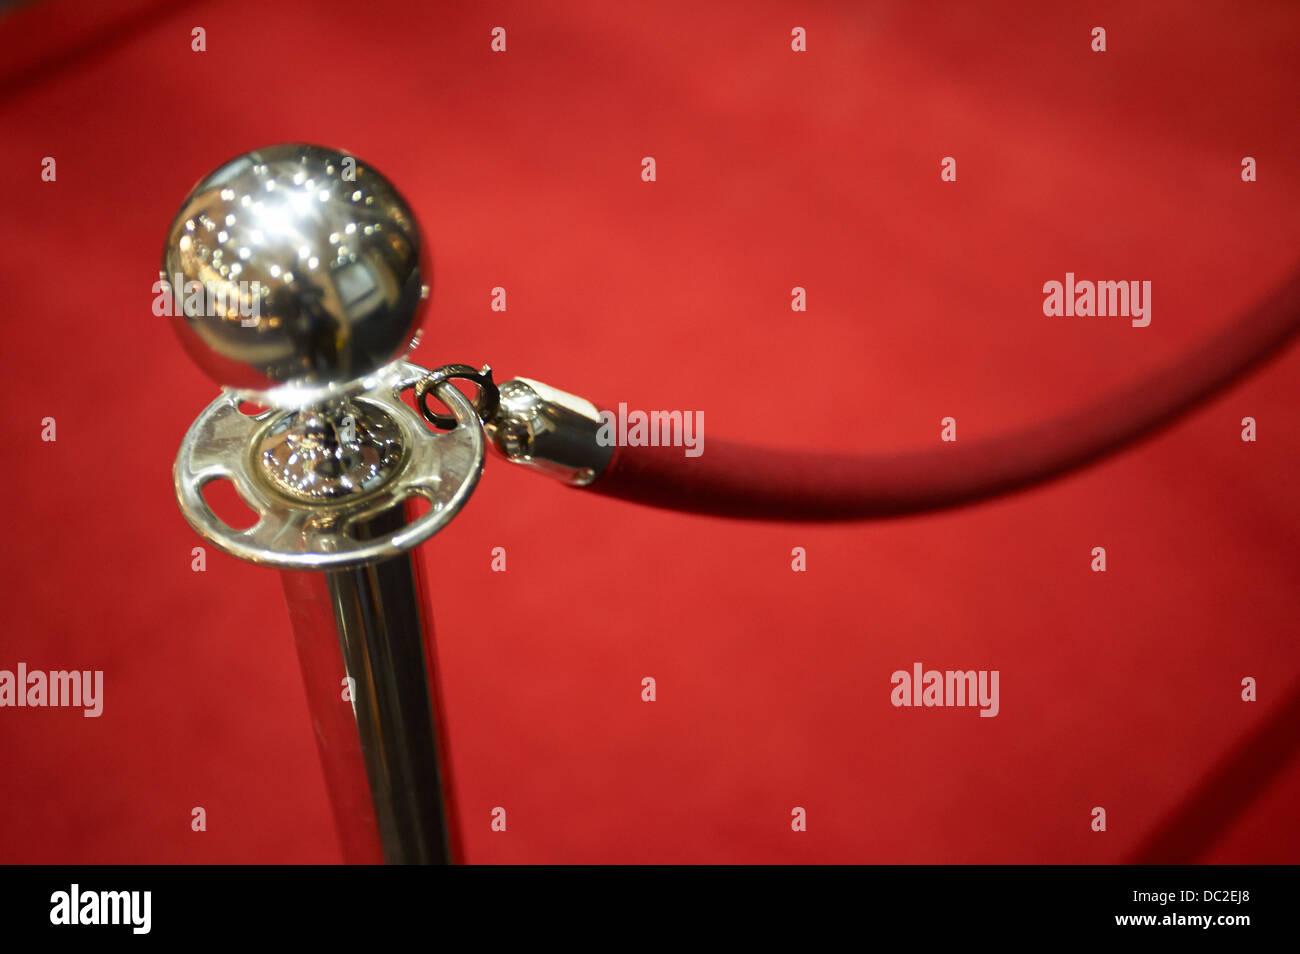 red carpet - Stock Image